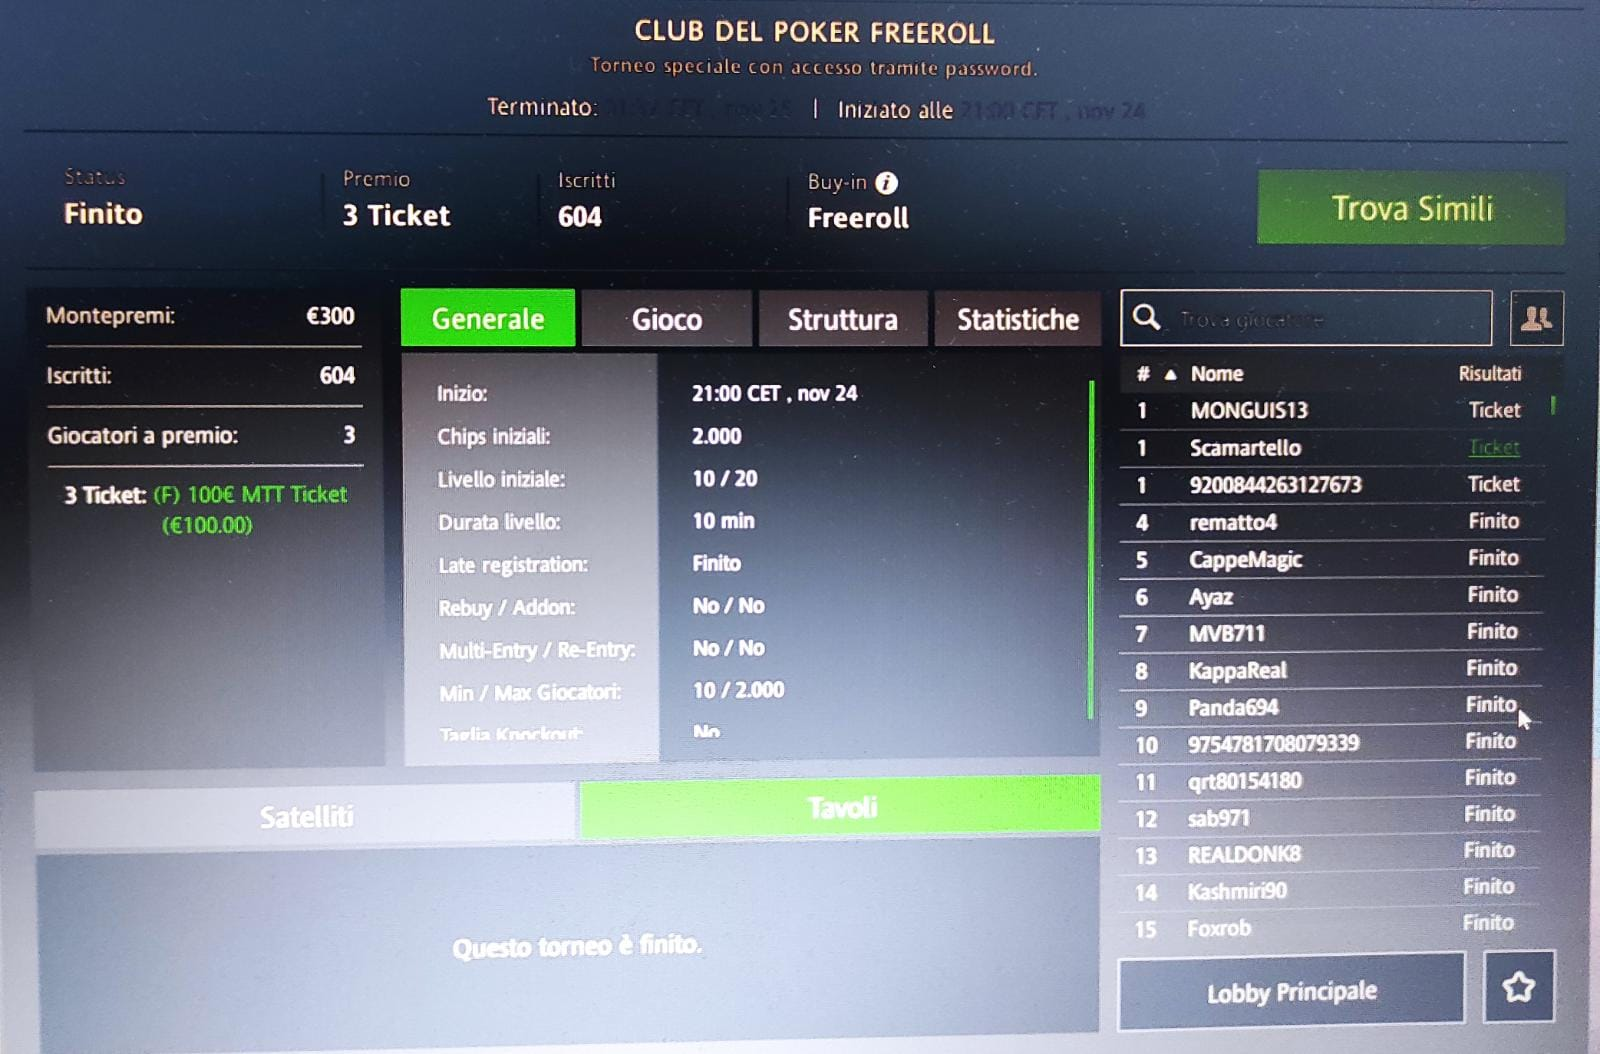 francesco scamardella vince ticket freeroll club del poker sisal